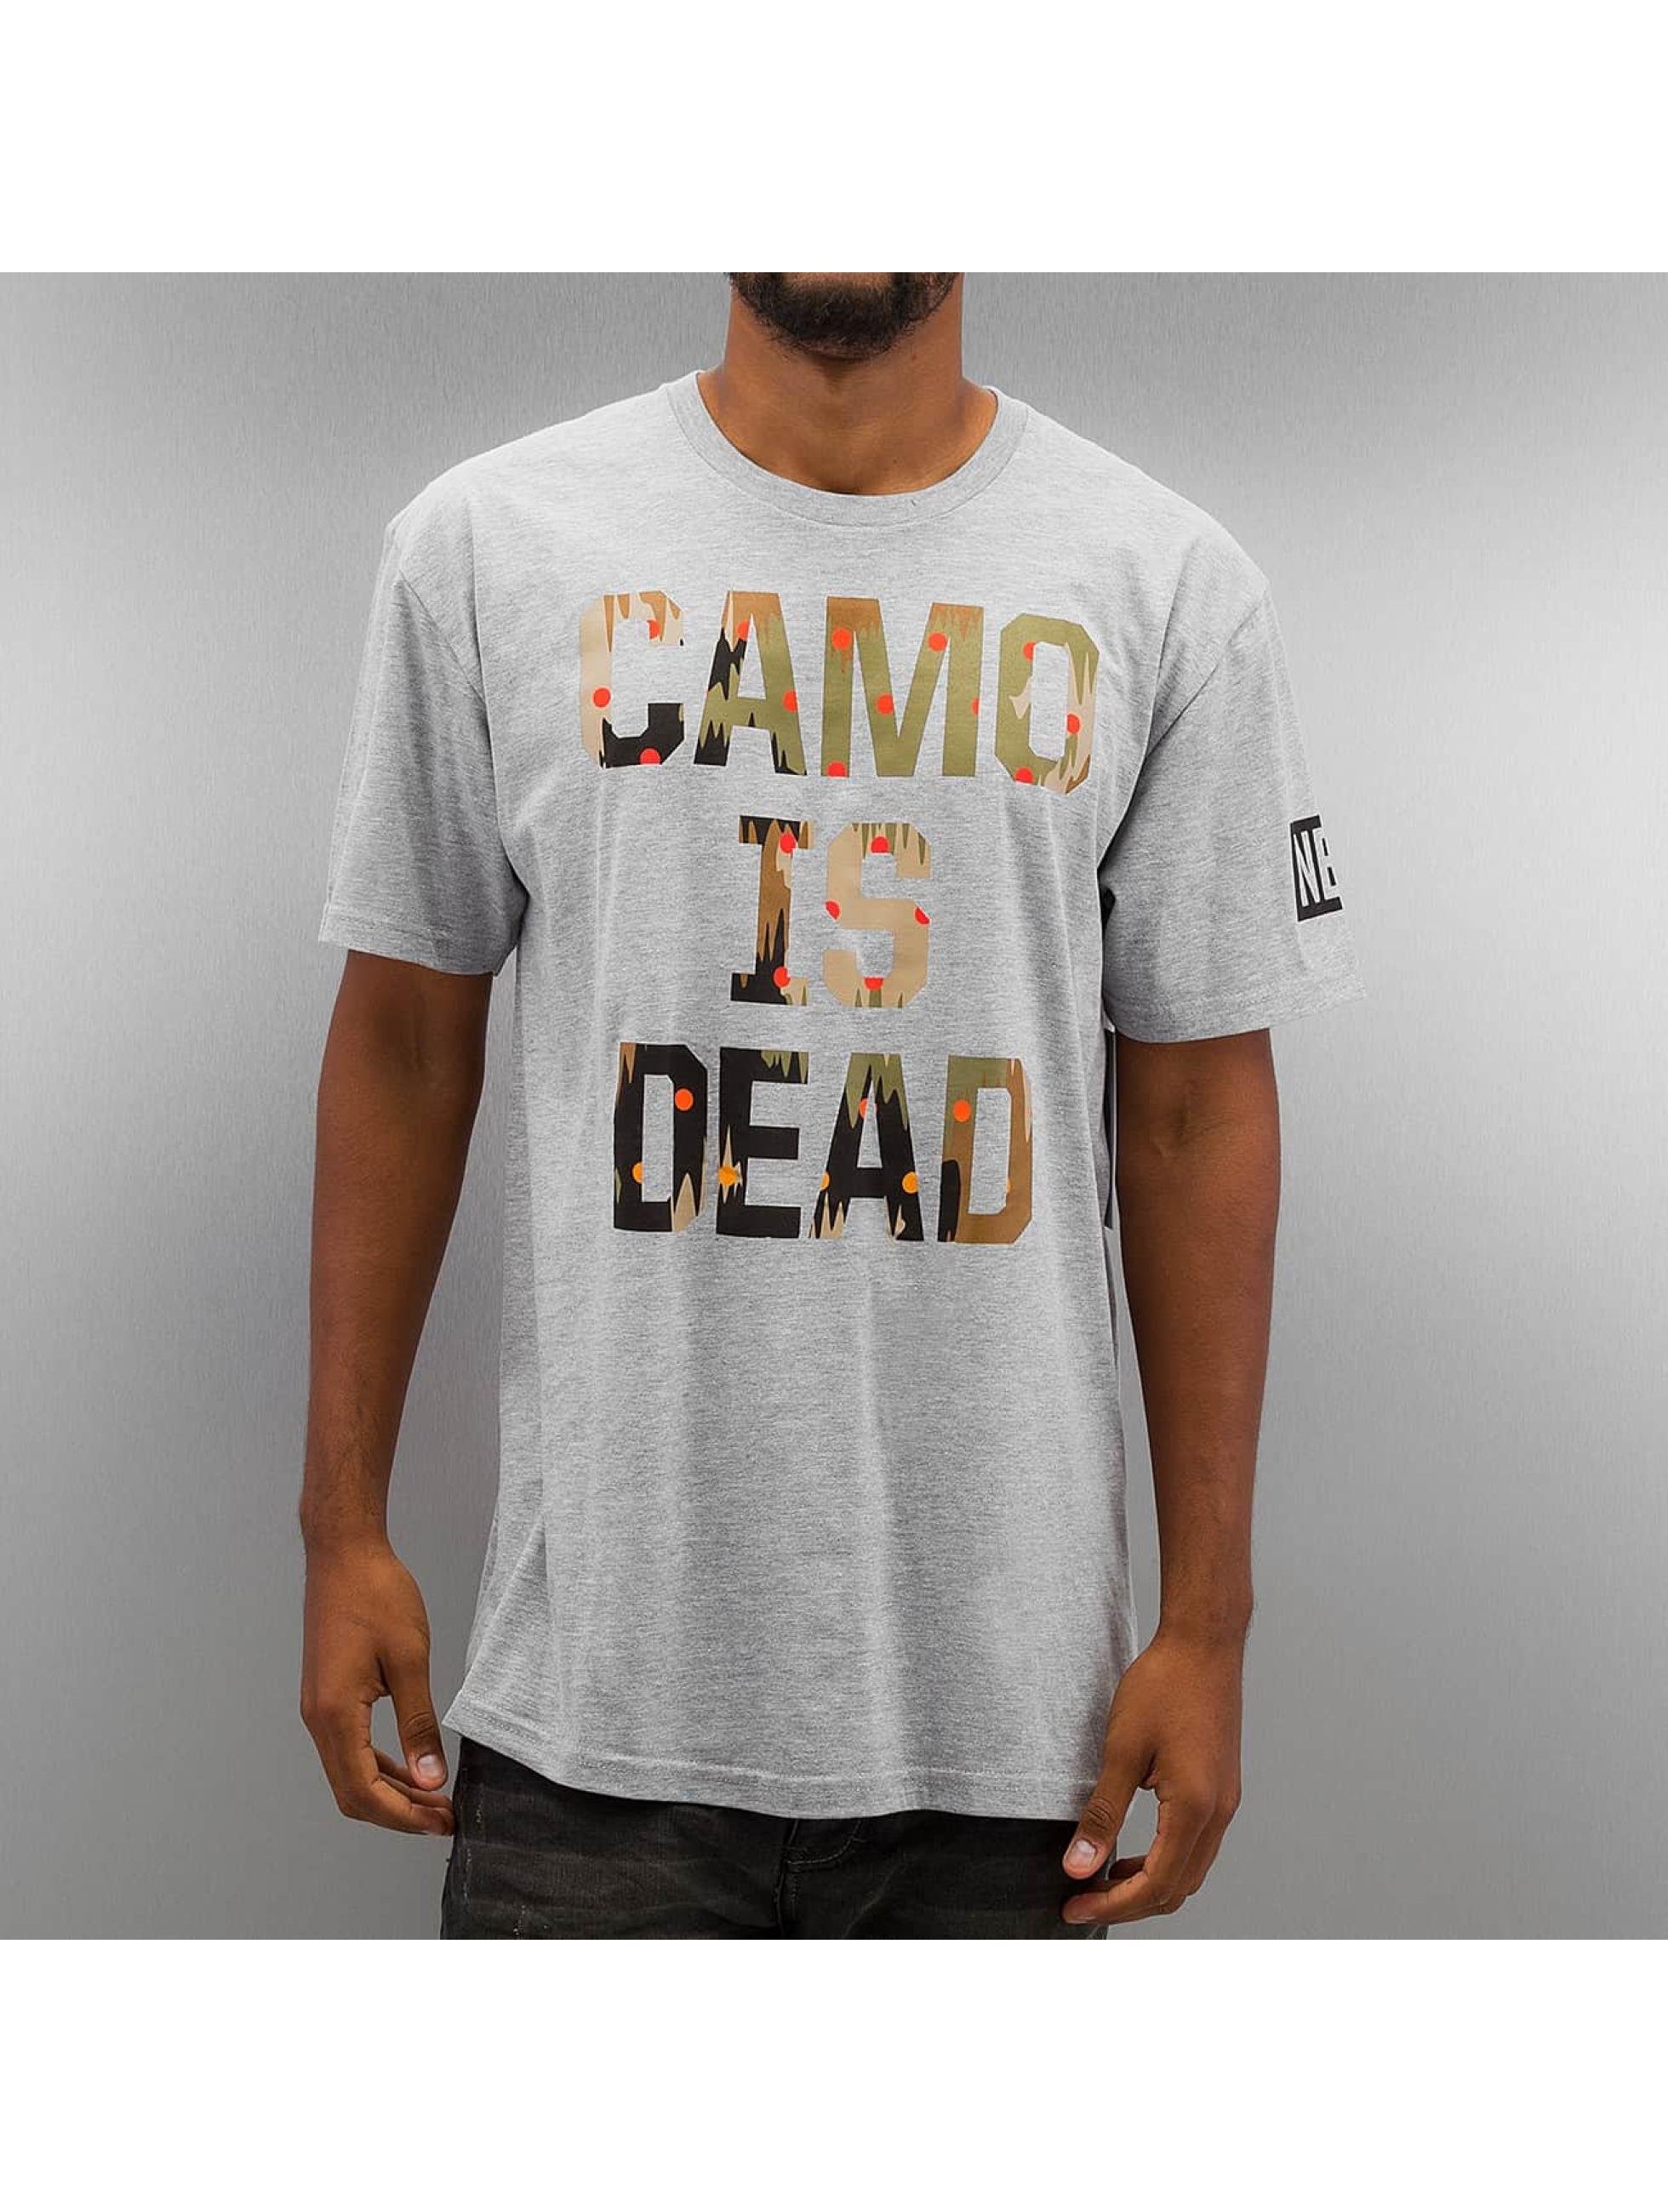 NEFF T-Shirt Camo is Dead gray